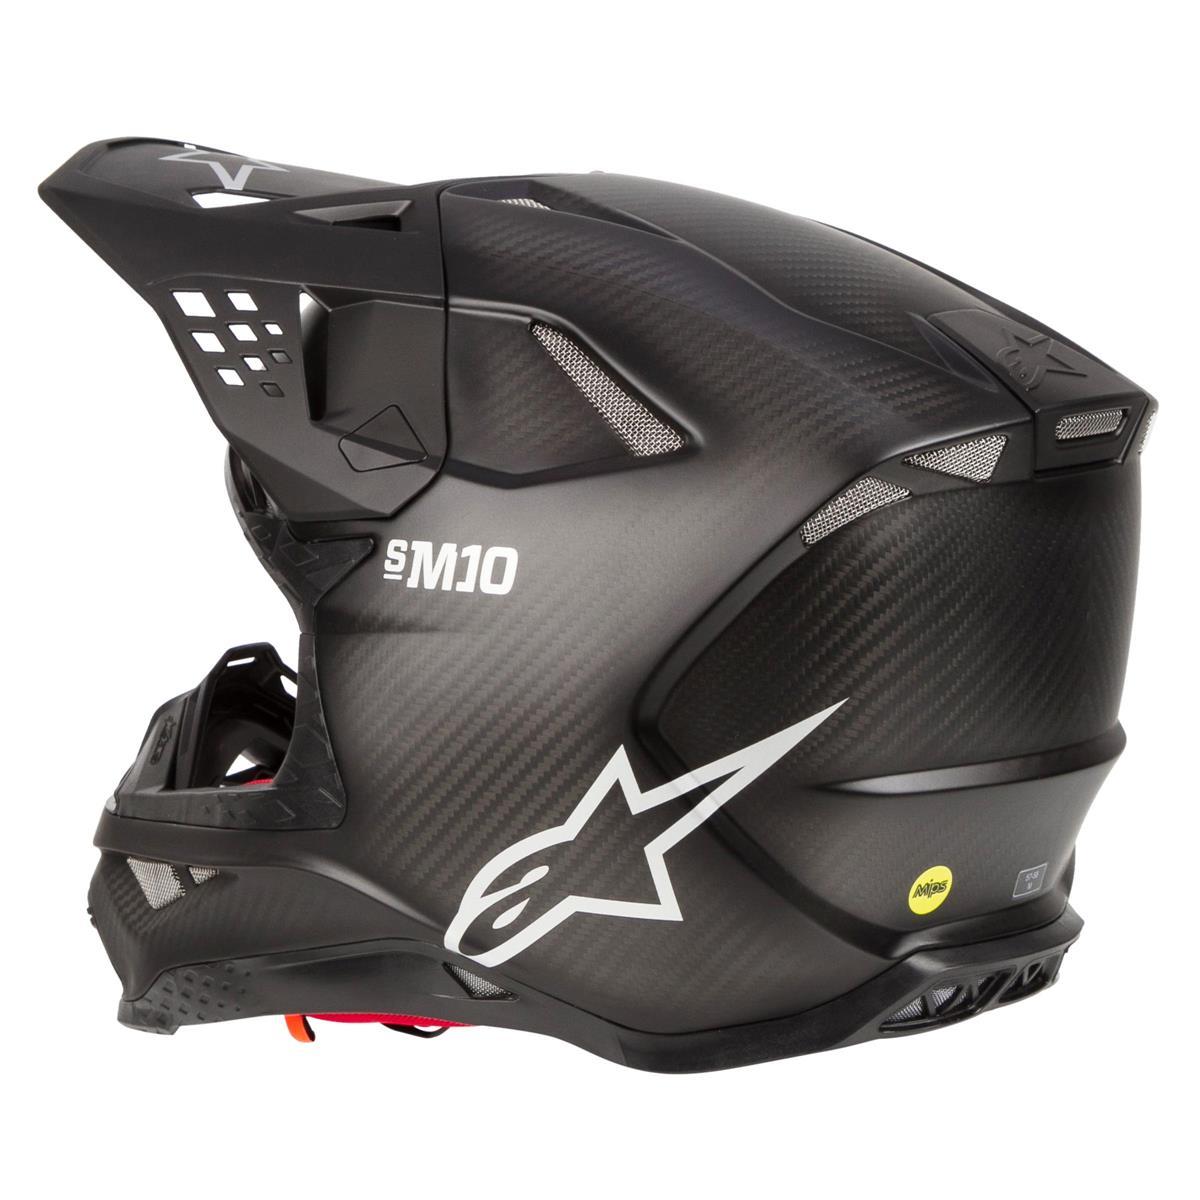 alpinestars-helm-helmet-supertech-s-m10-5 (2)